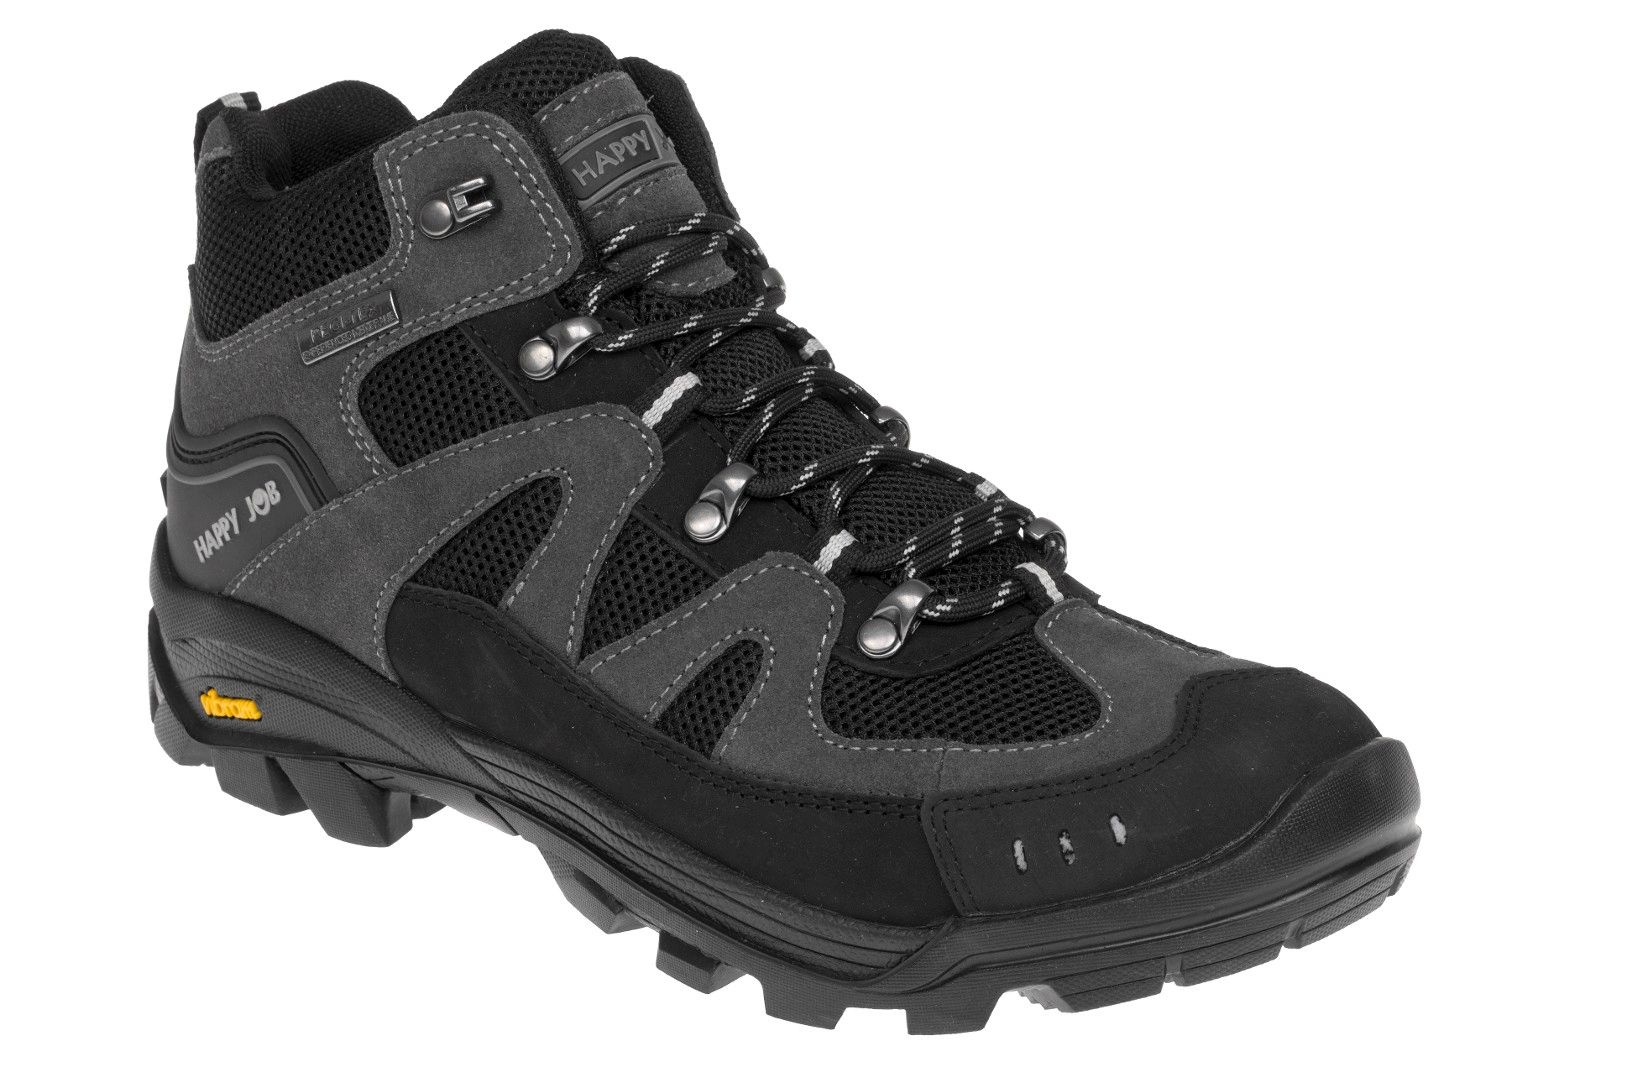 550011 COLORADO obuv prac. 41